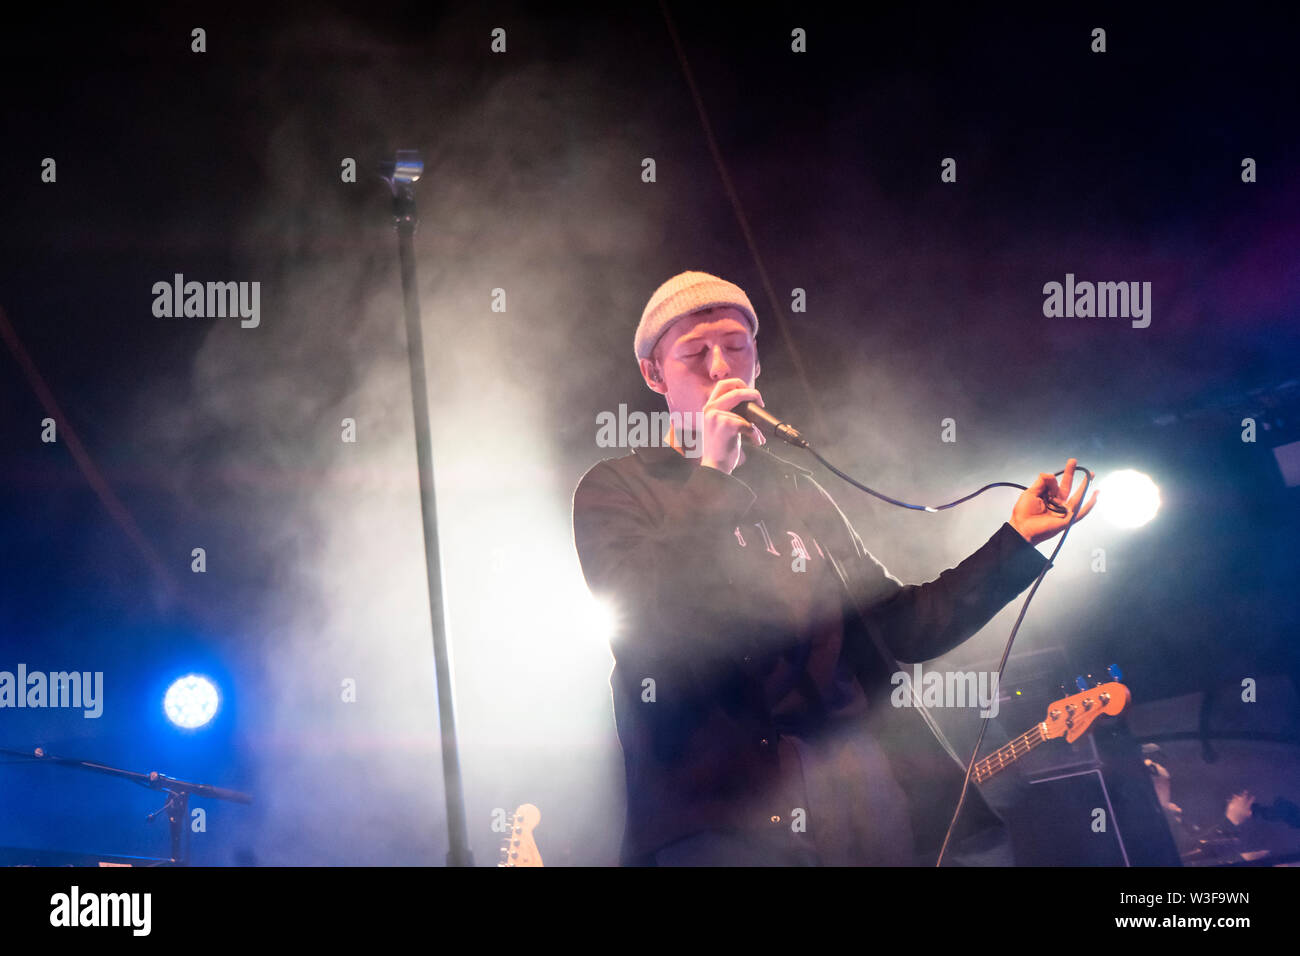 Bergen, Norway - June 16th, 2019. The Norwegian singer, songwriter and musician dePresno performs a live concert during the Norwegian music festival Bergenfest 2019 in Bergen. (Photo credit: Gonzales Photo - Jarle H. Moe). - Stock Image